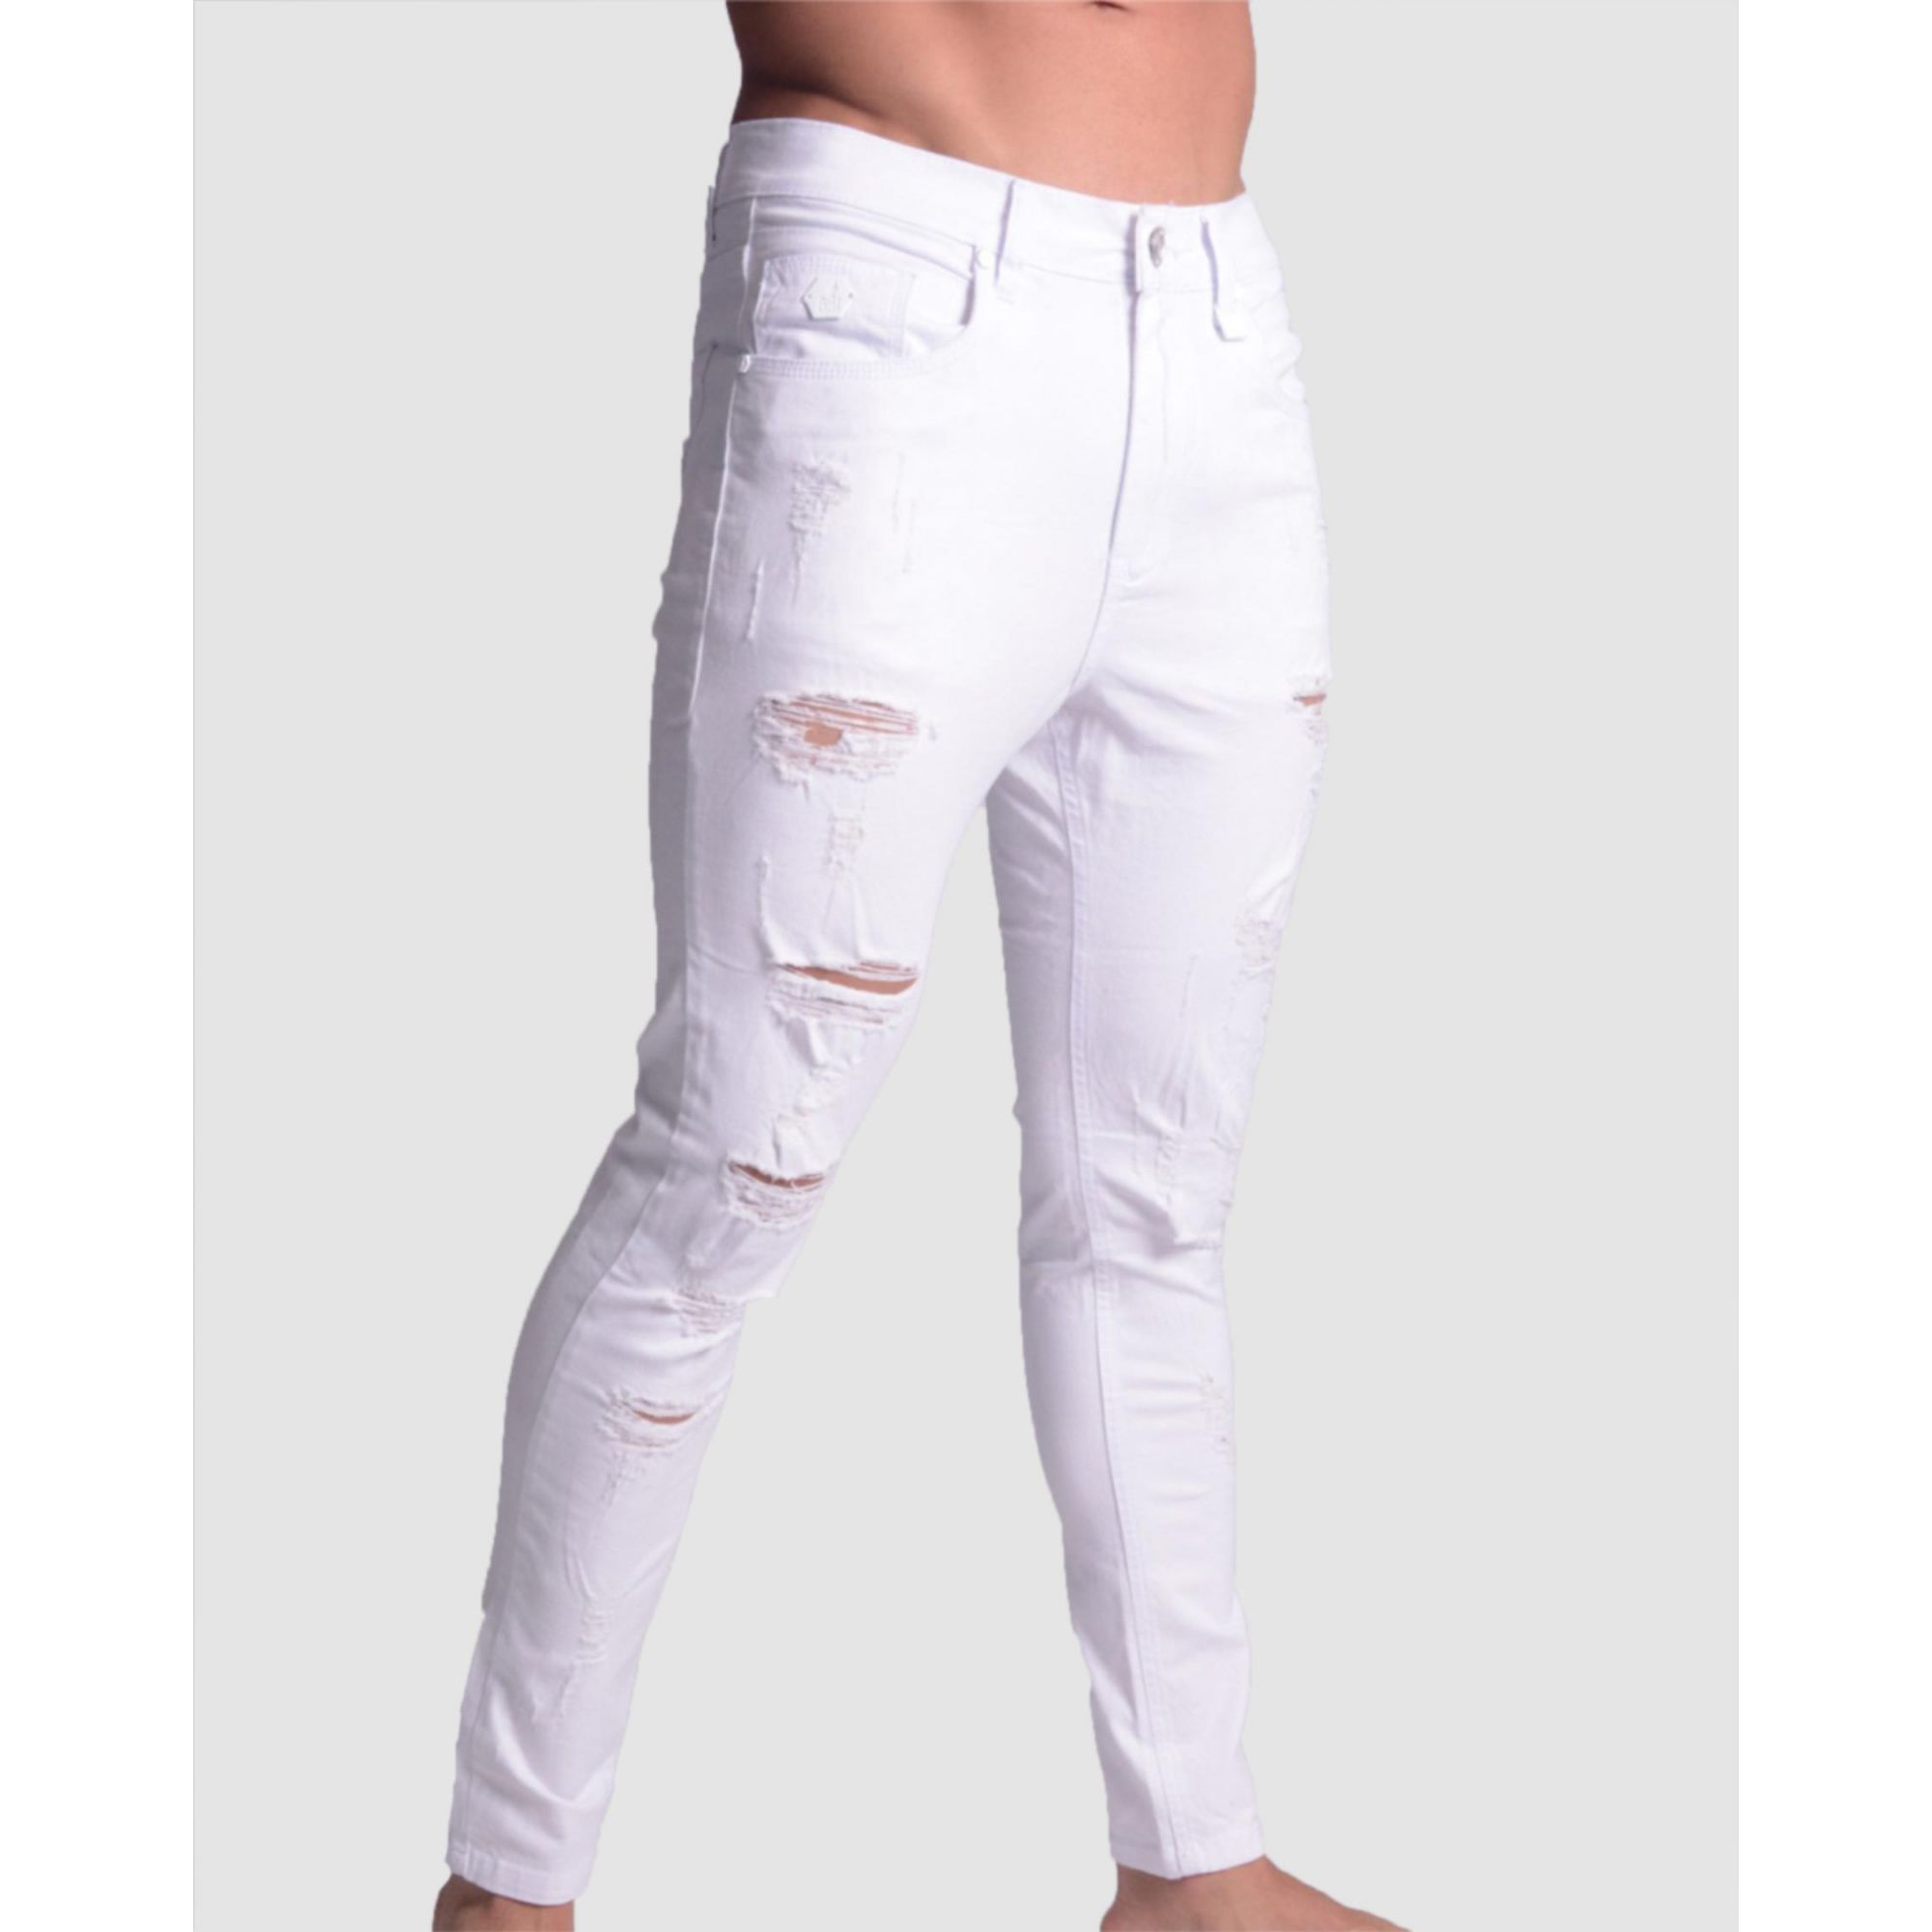 Calça Buh Jeans White